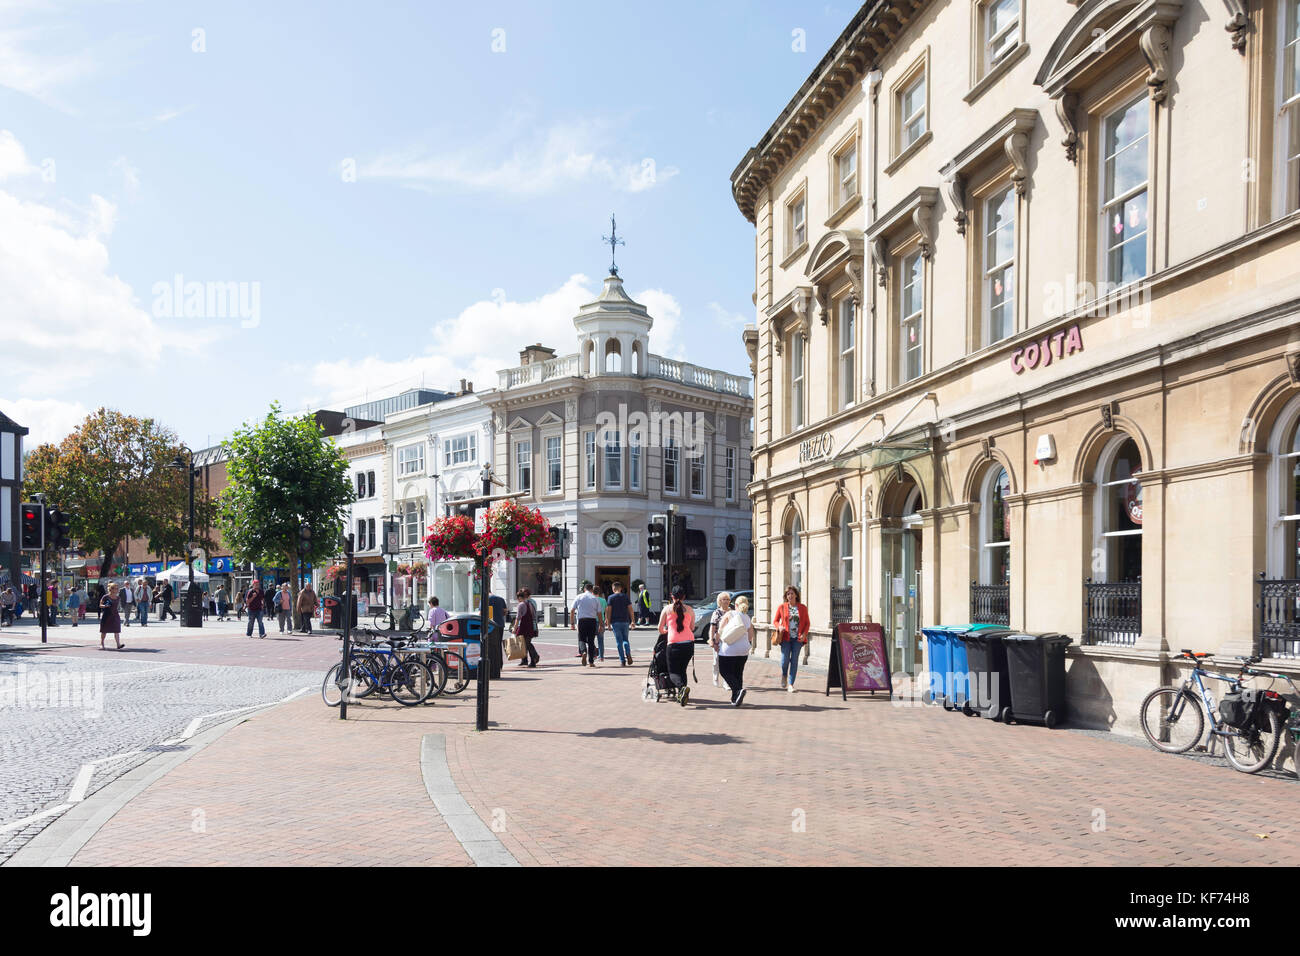 Corporation and High Streets, Taunton, Somerset, England, United Kingdom - Stock Image